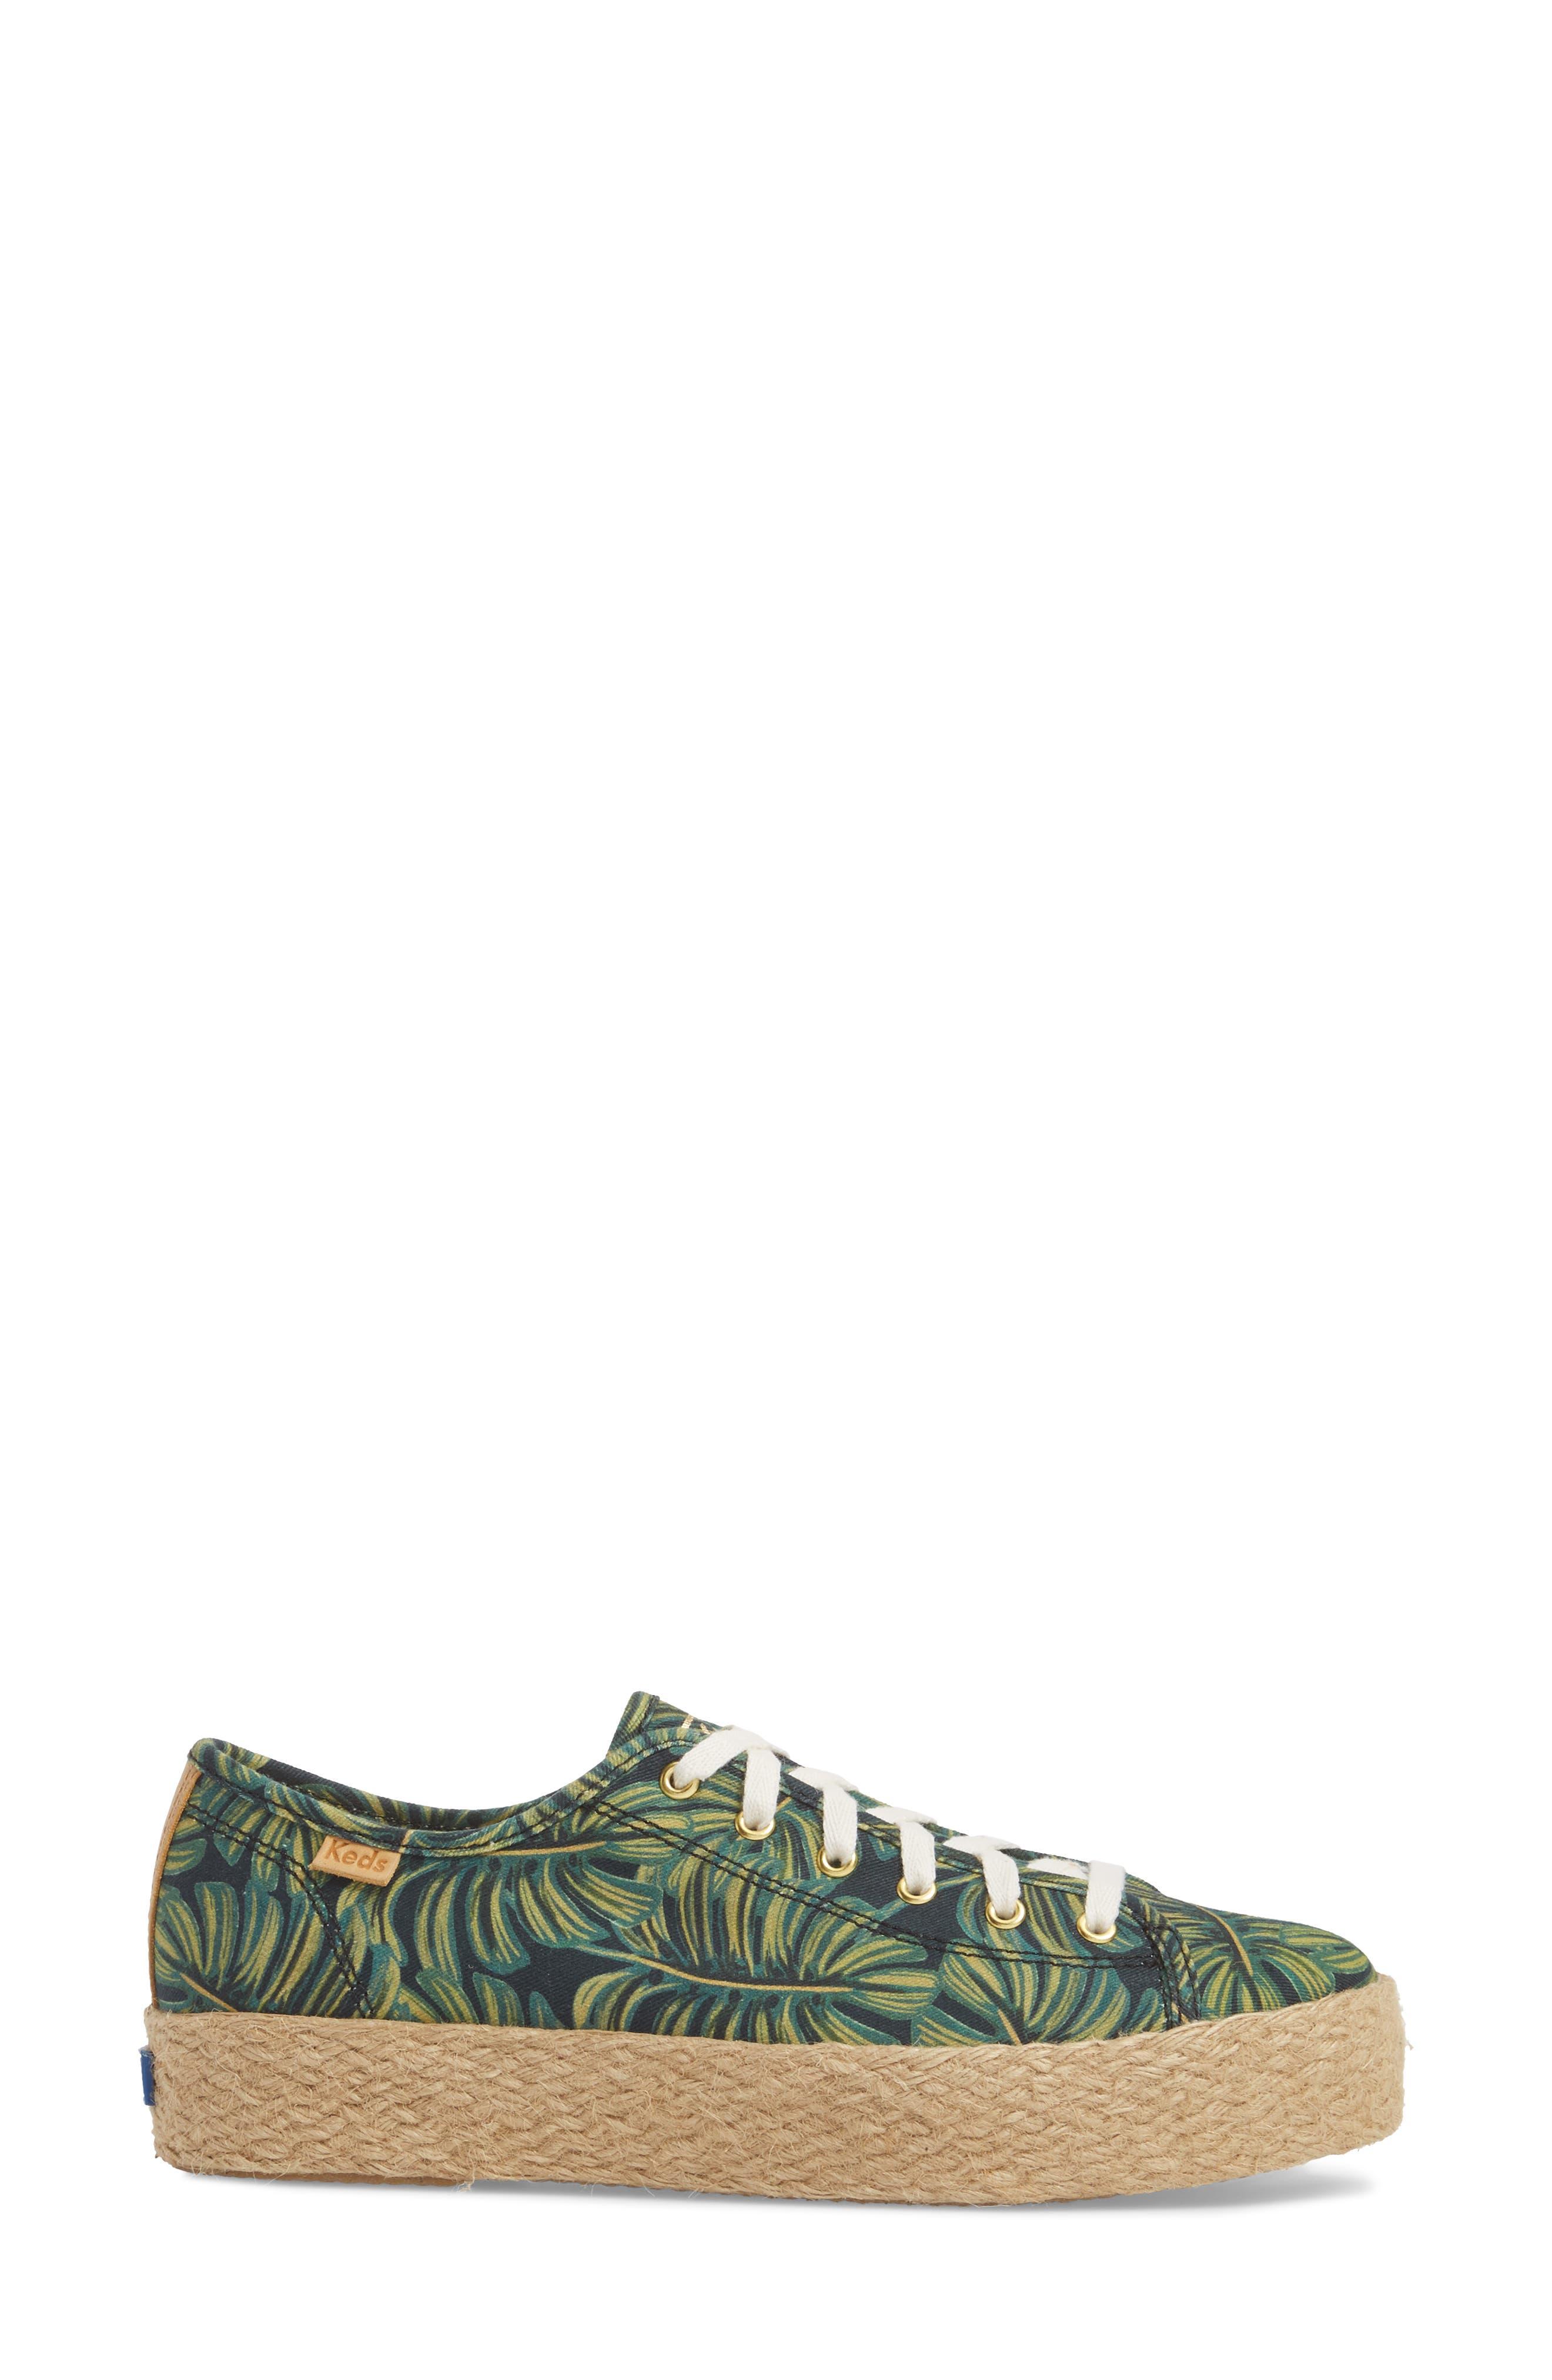 KEDS<SUP>®</SUP>, x Rifle Paper Co. Triple Kick Palms Platform Sneaker, Alternate thumbnail 3, color, 001